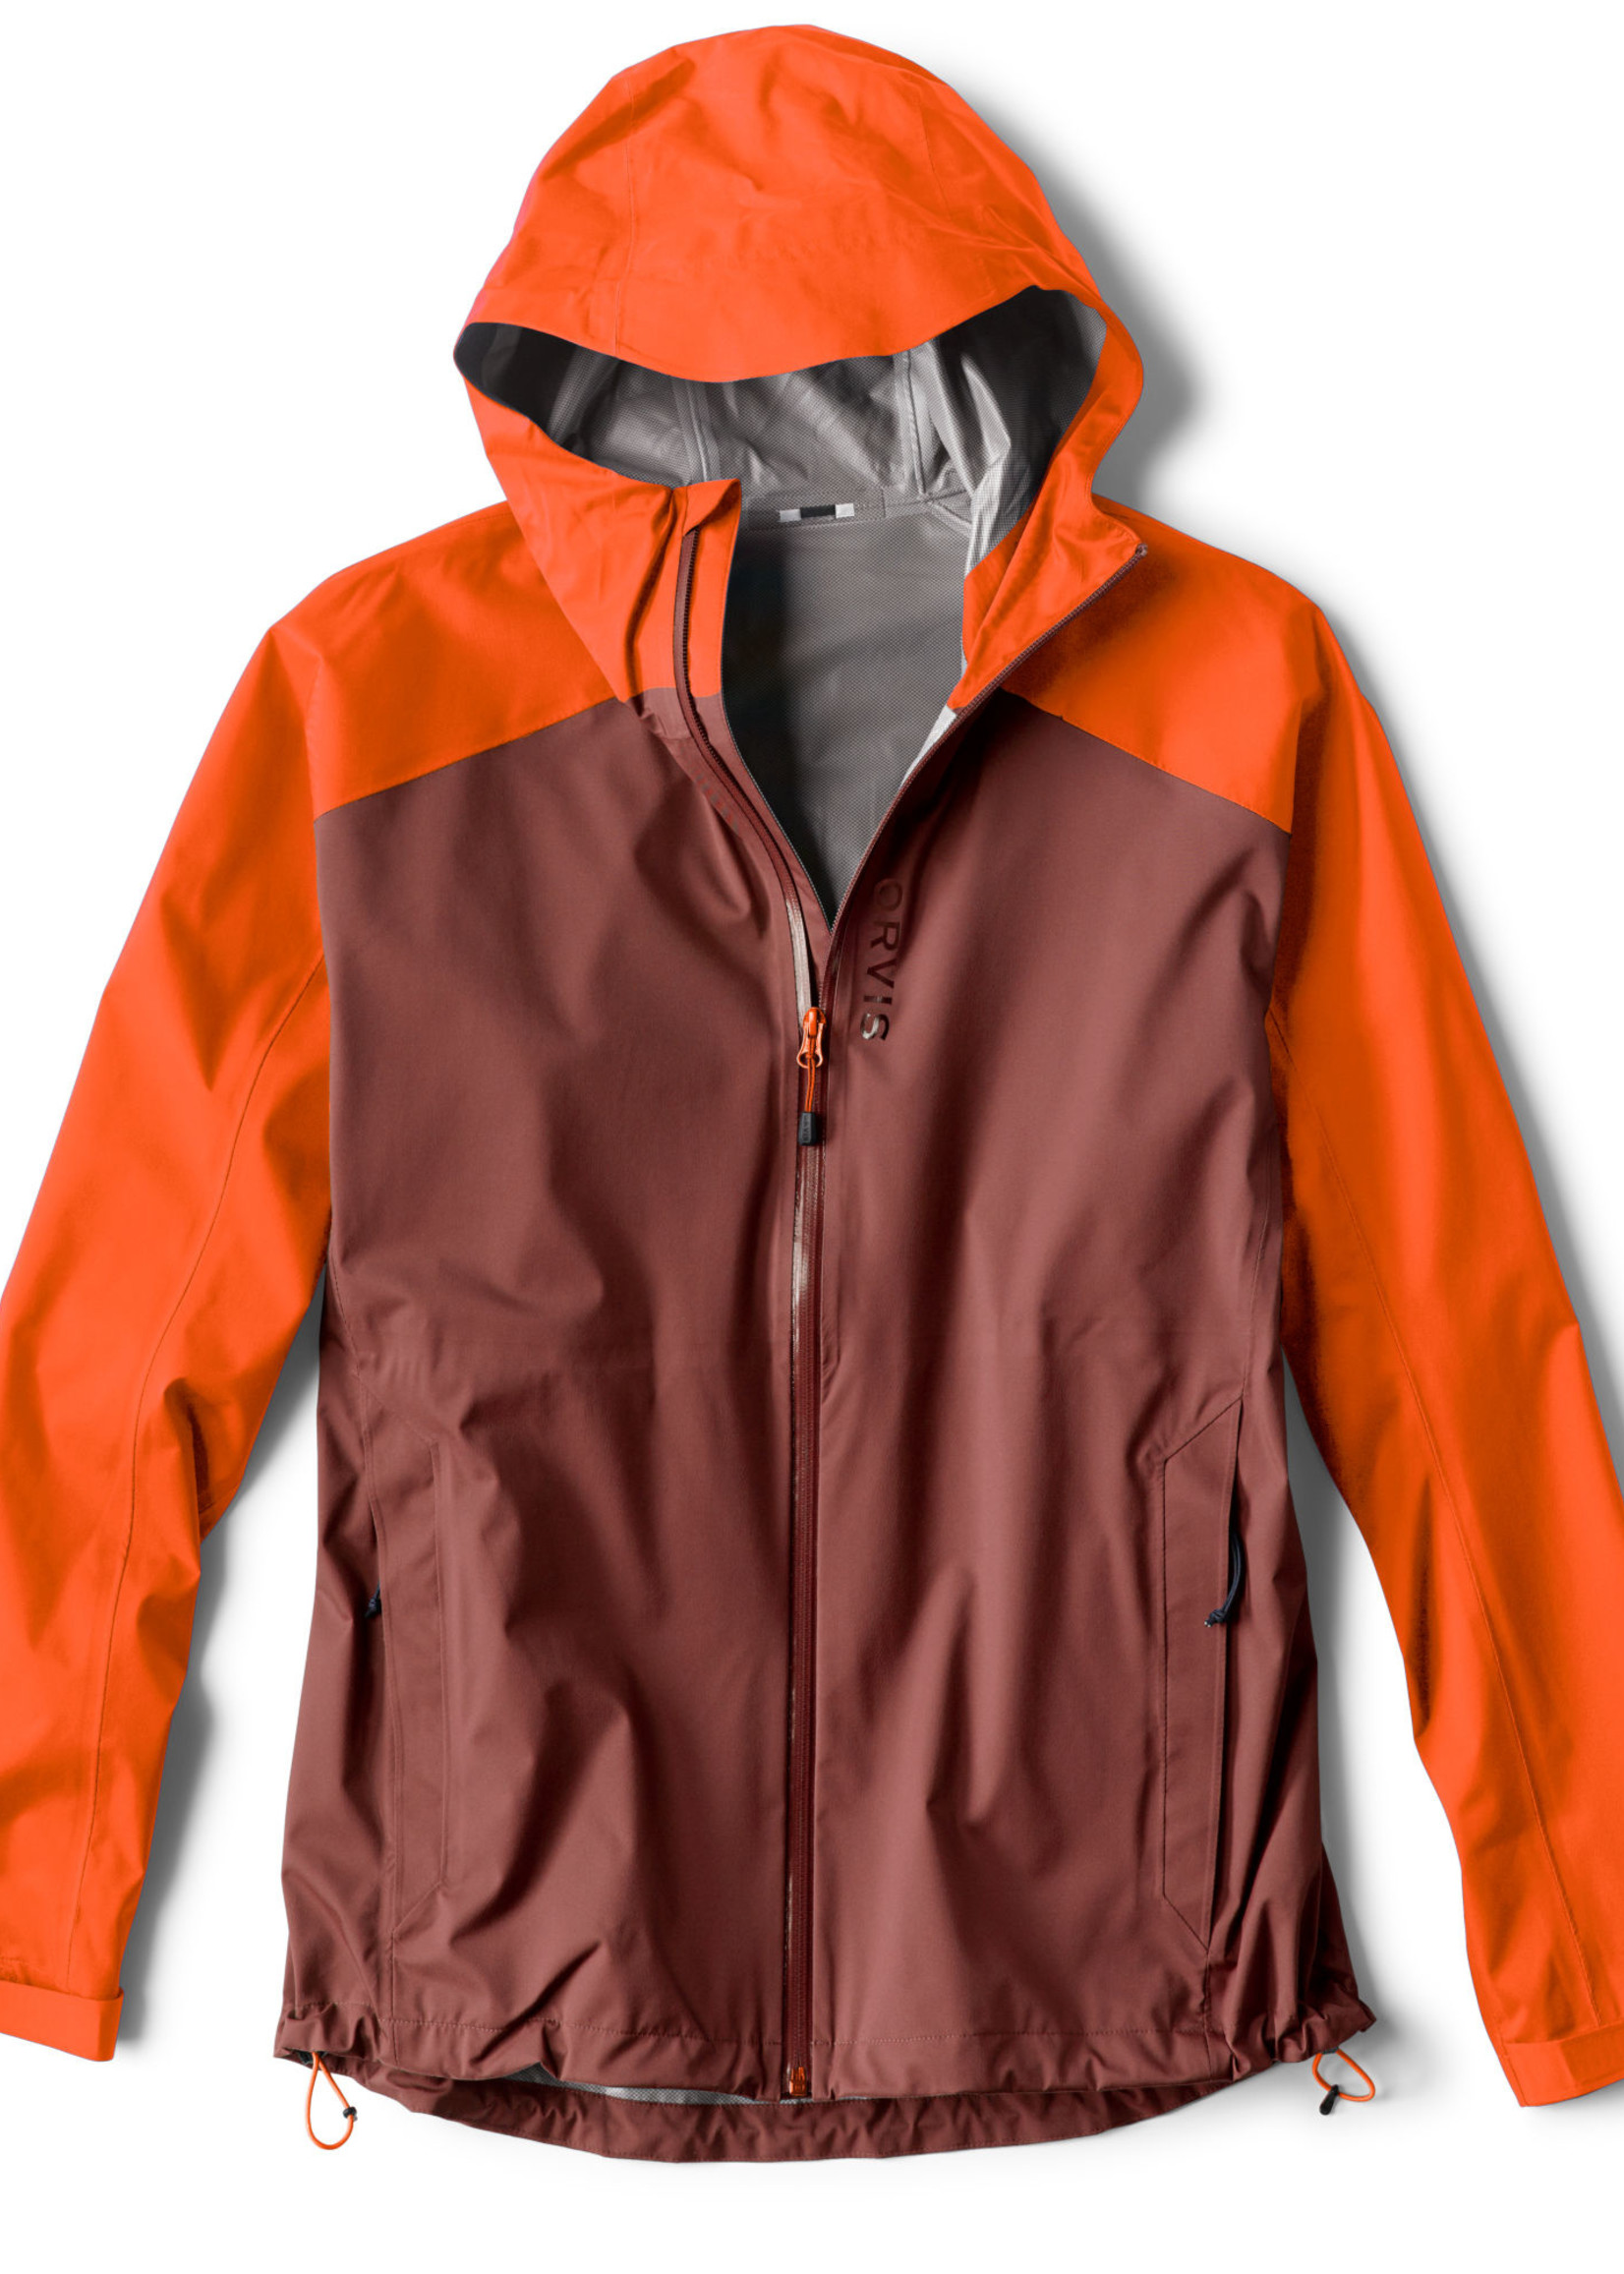 ORVIS Men's Ultralight Storm Jacket